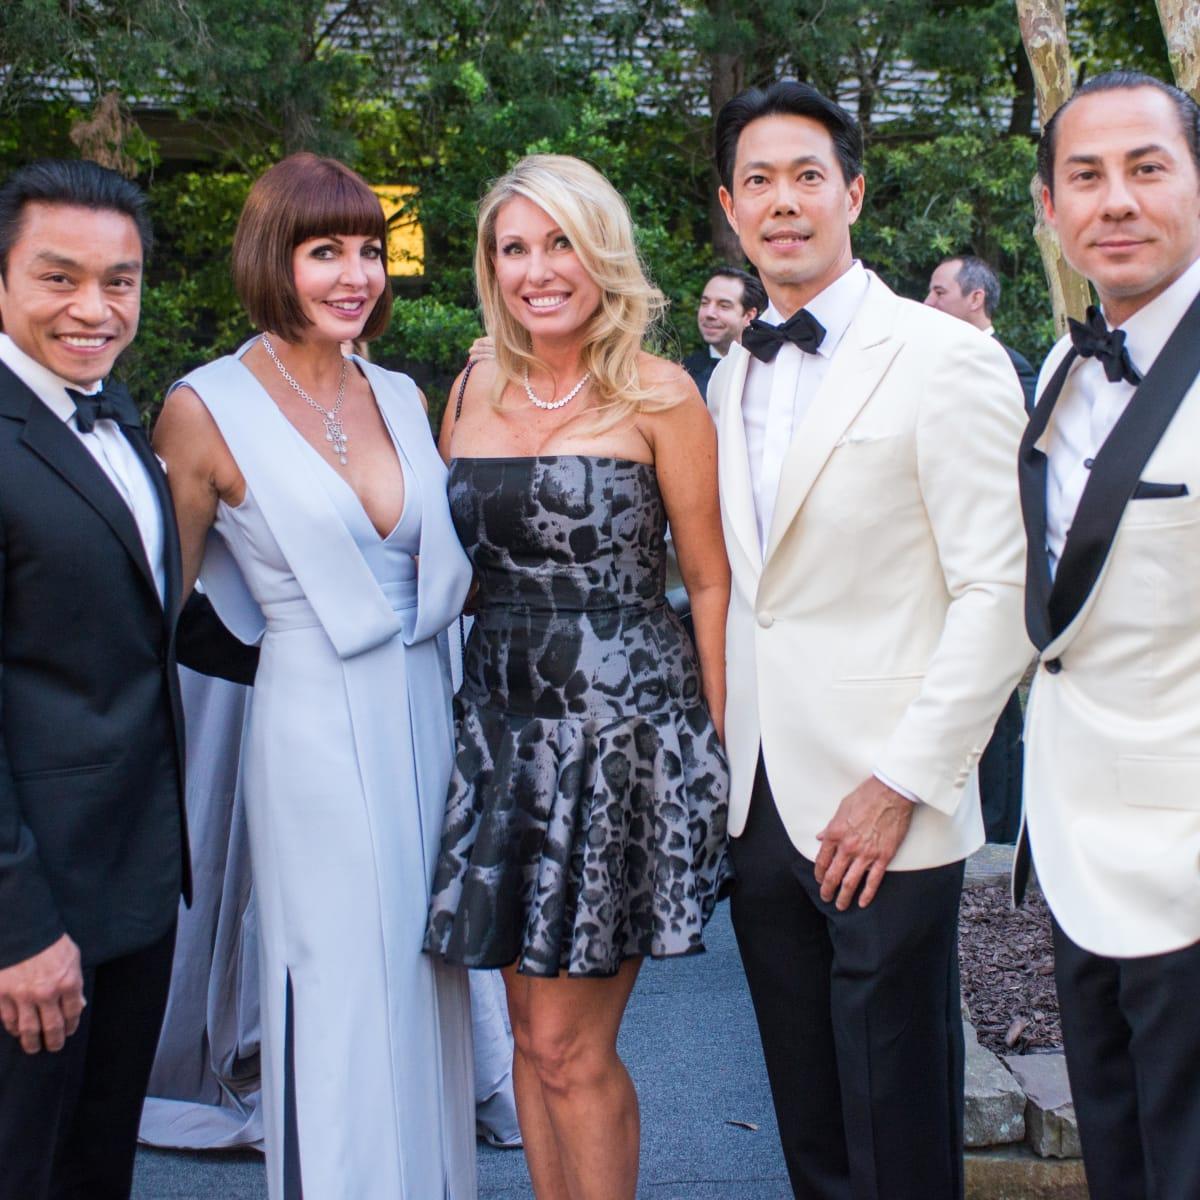 Van CleeF & Arpels party, April 2016, Quang Henderson, Staci Henderson, Tifany Wong, Randall Wong, Cenk Ozdogan